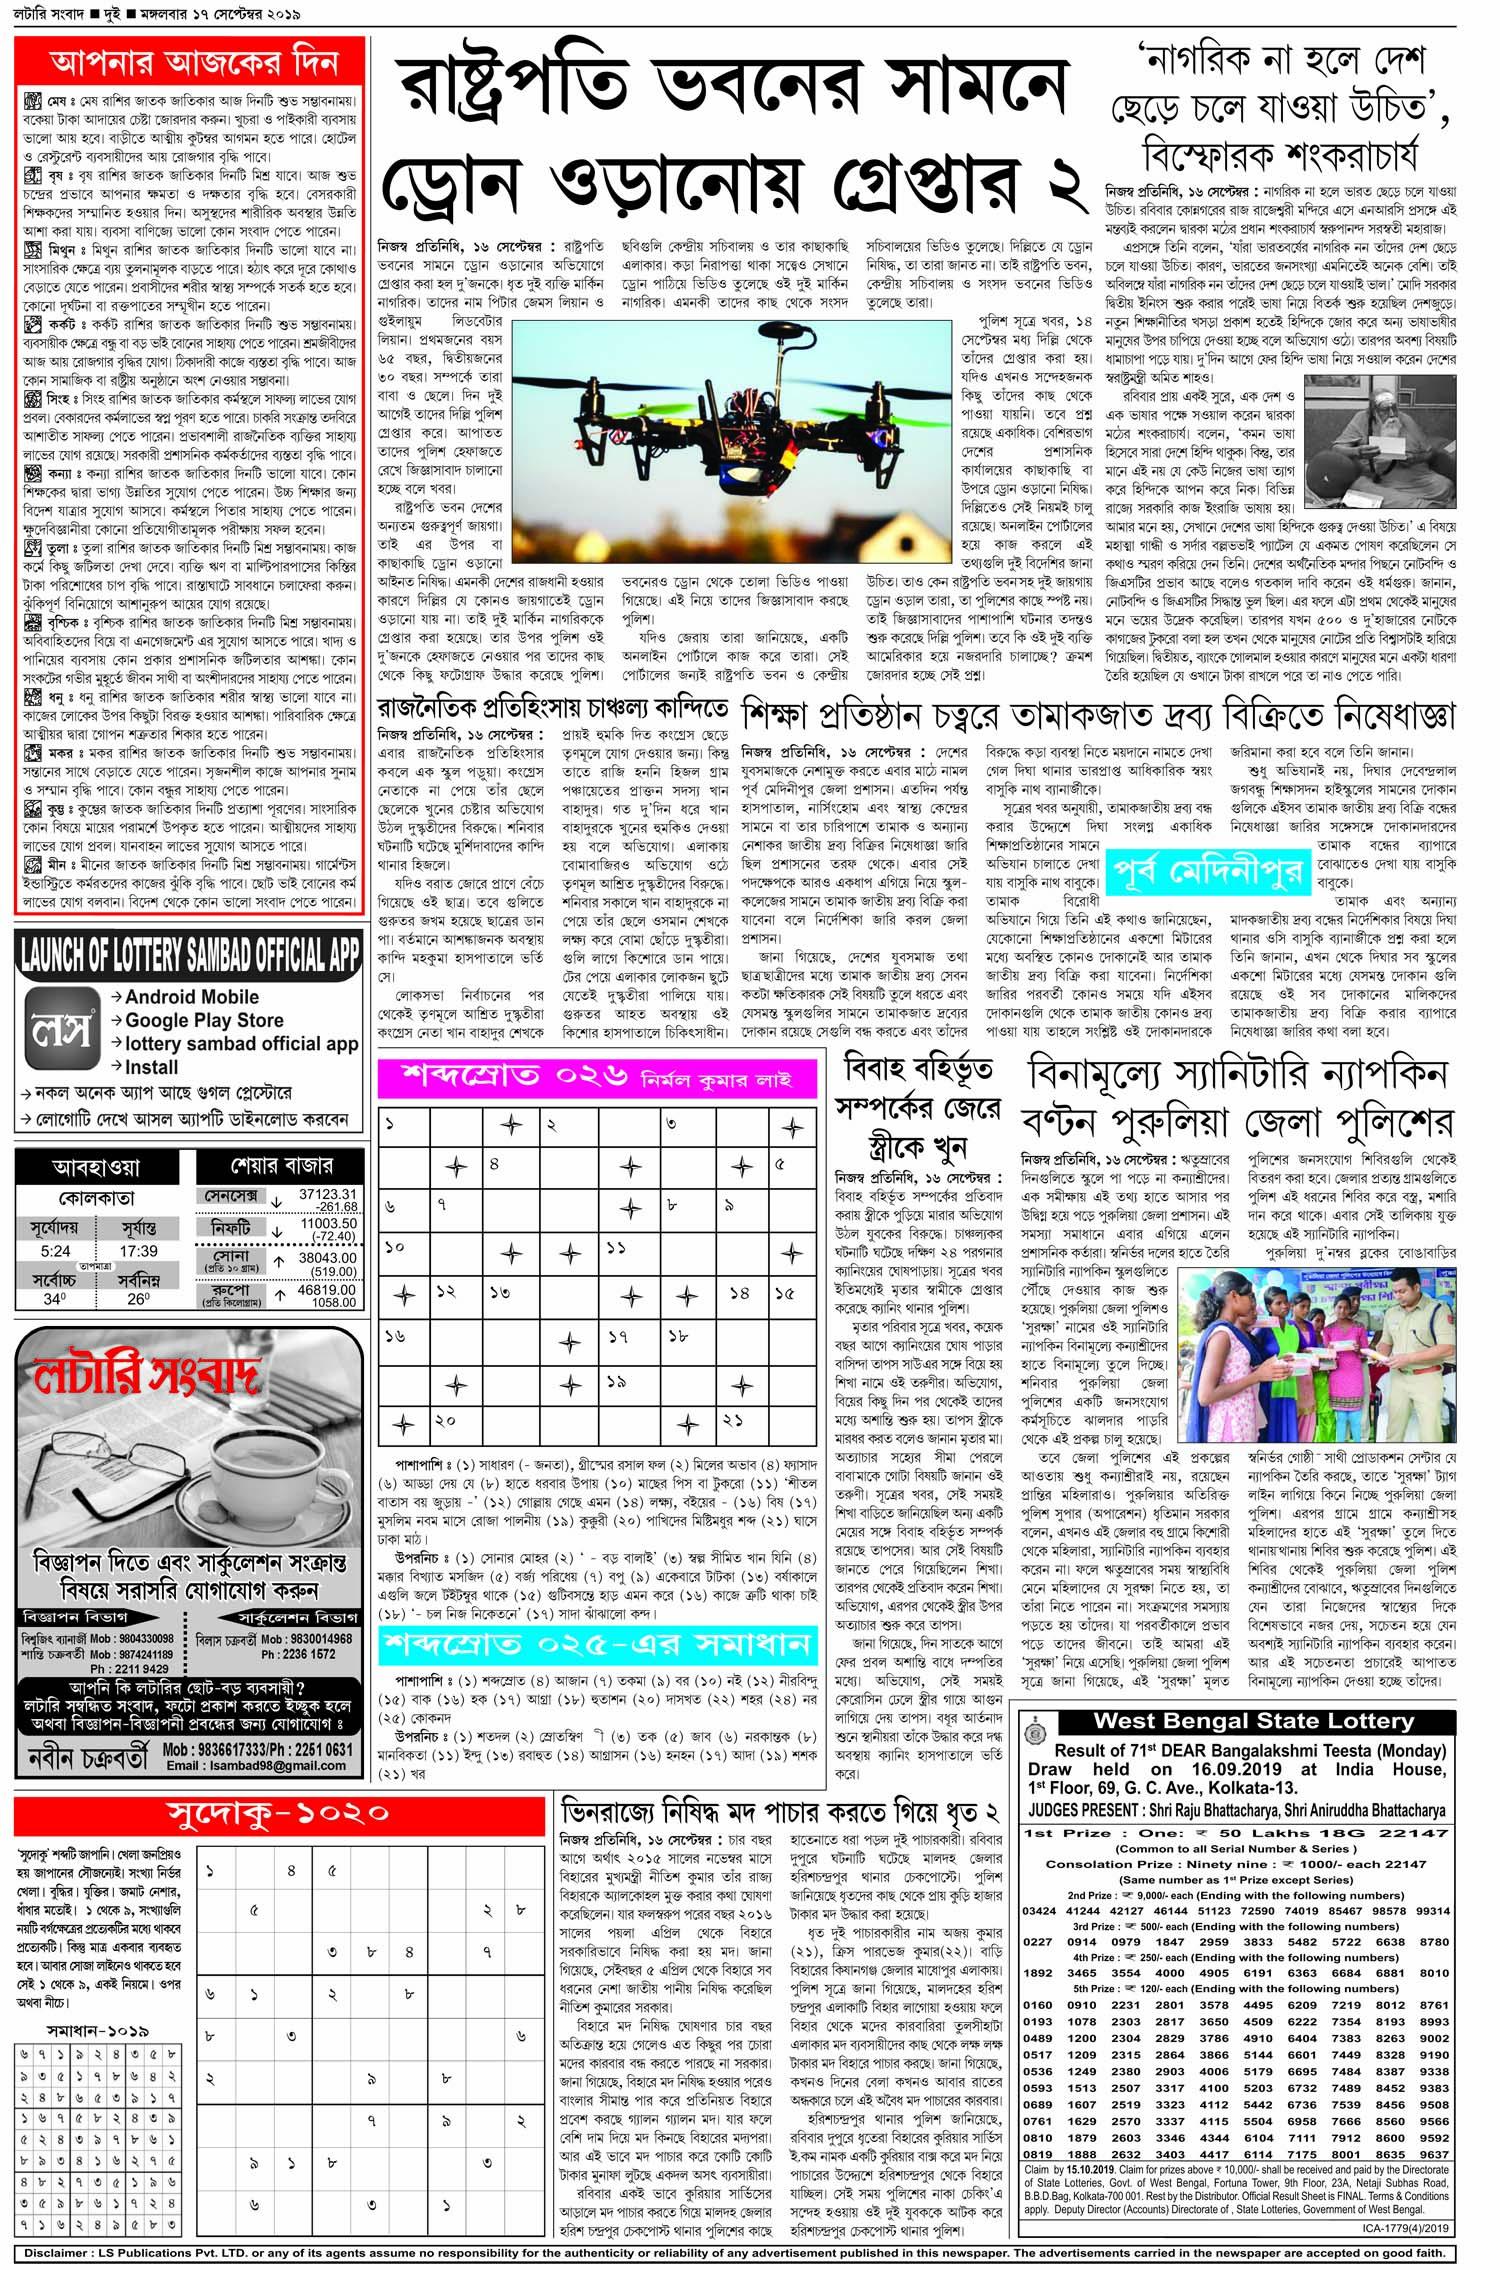 Epaper Sambad 17-09-2019 page 2